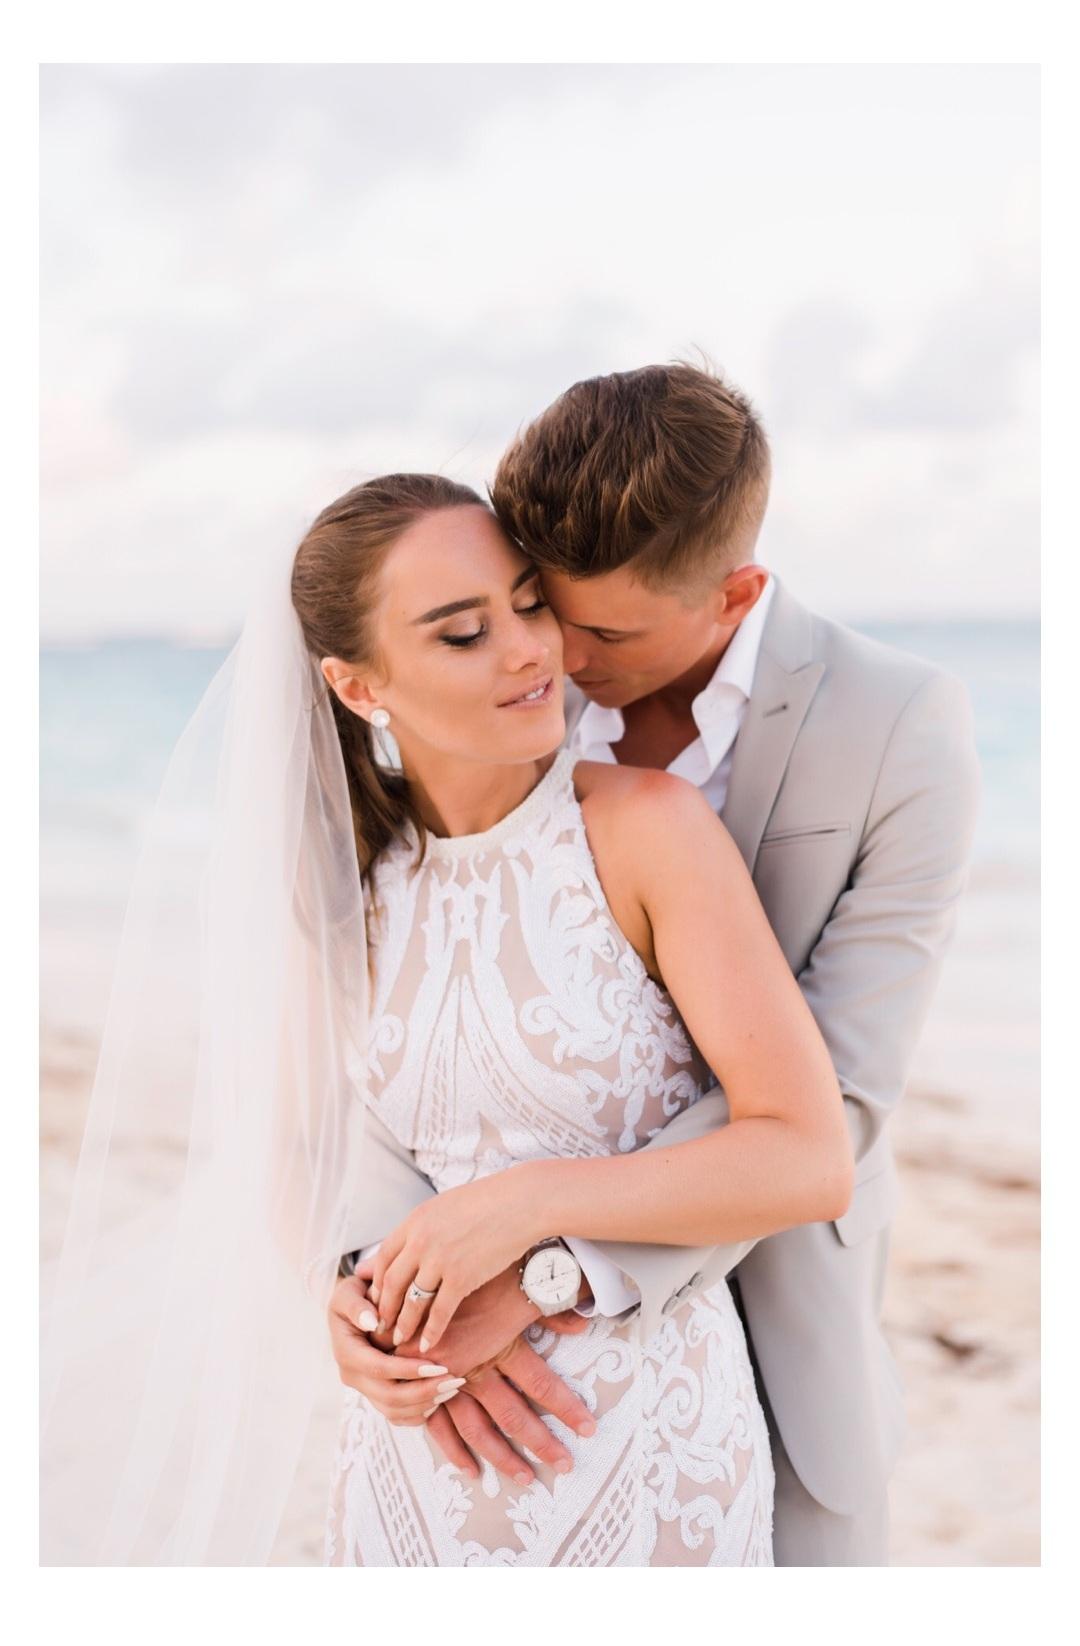 Sneak Peek from A Destination Wedding in Dominican Republic | Halifax Wedding Photographer